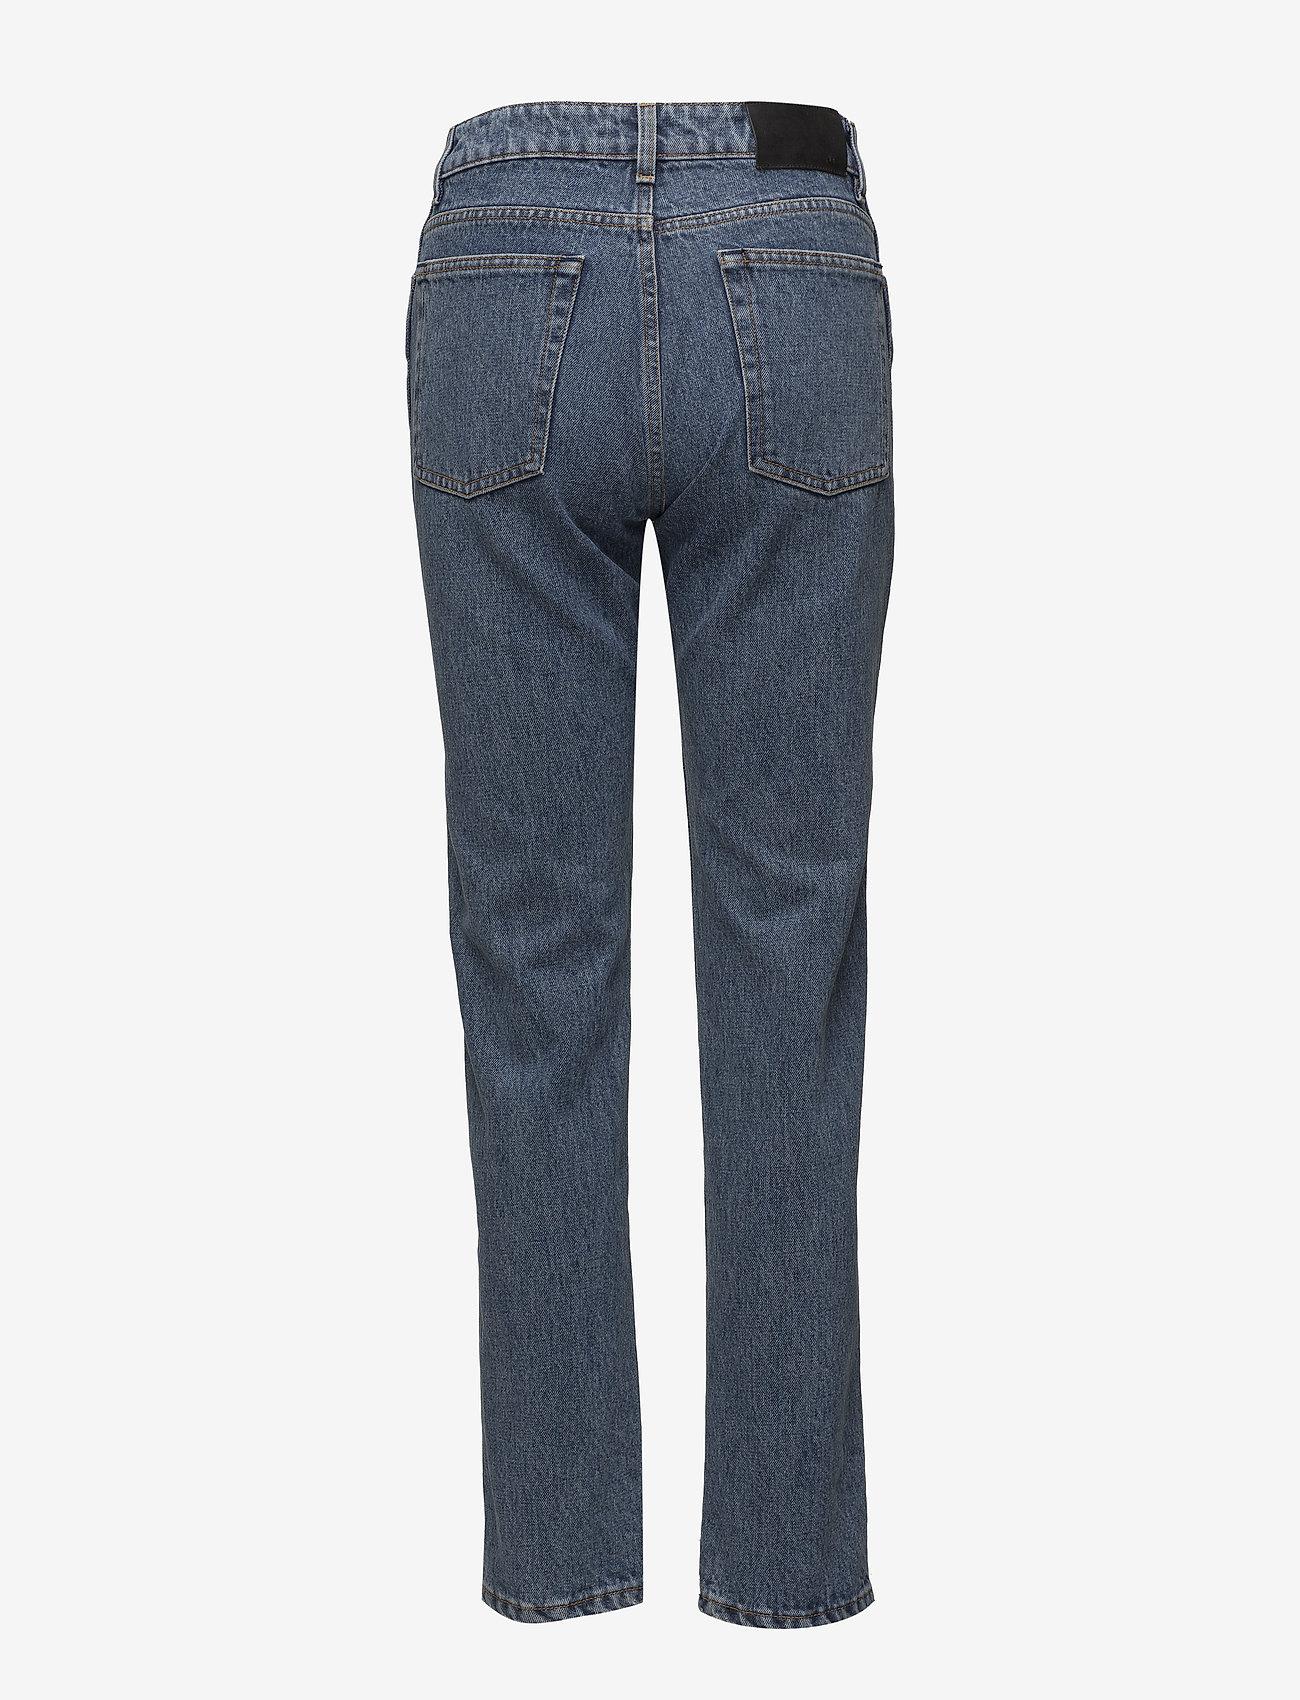 J. Lindeberg Study Fuji Blue - Jeans MID BLUE